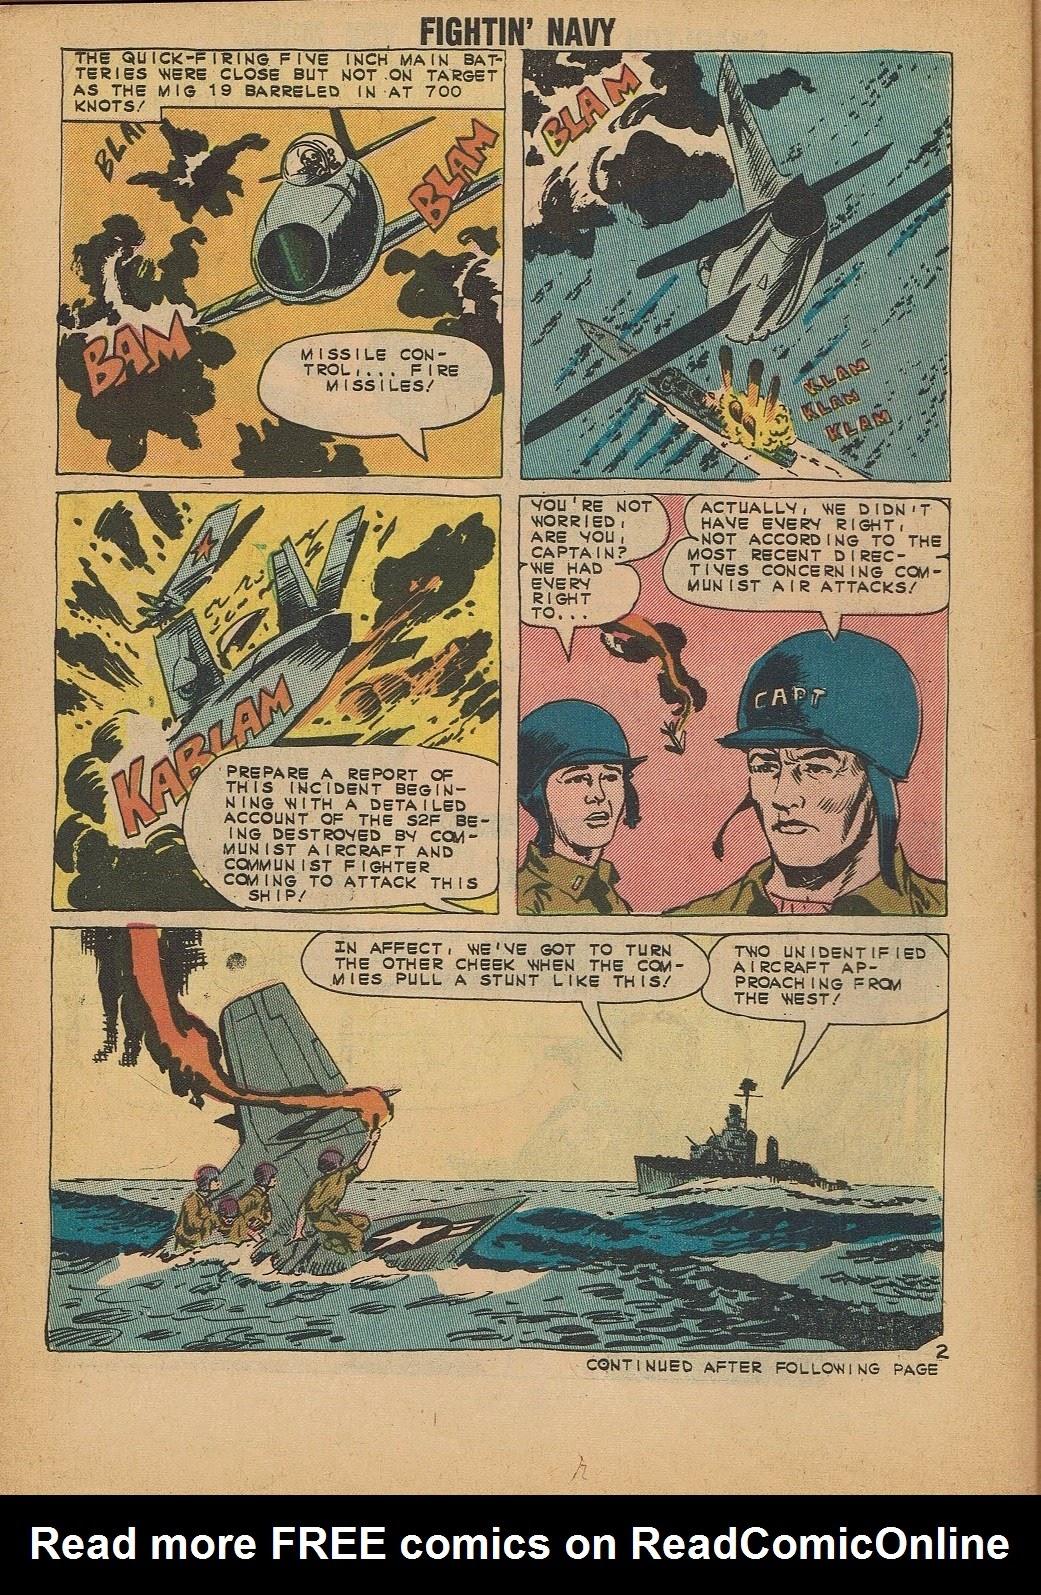 Read online Fightin' Navy comic -  Issue #112 - 30